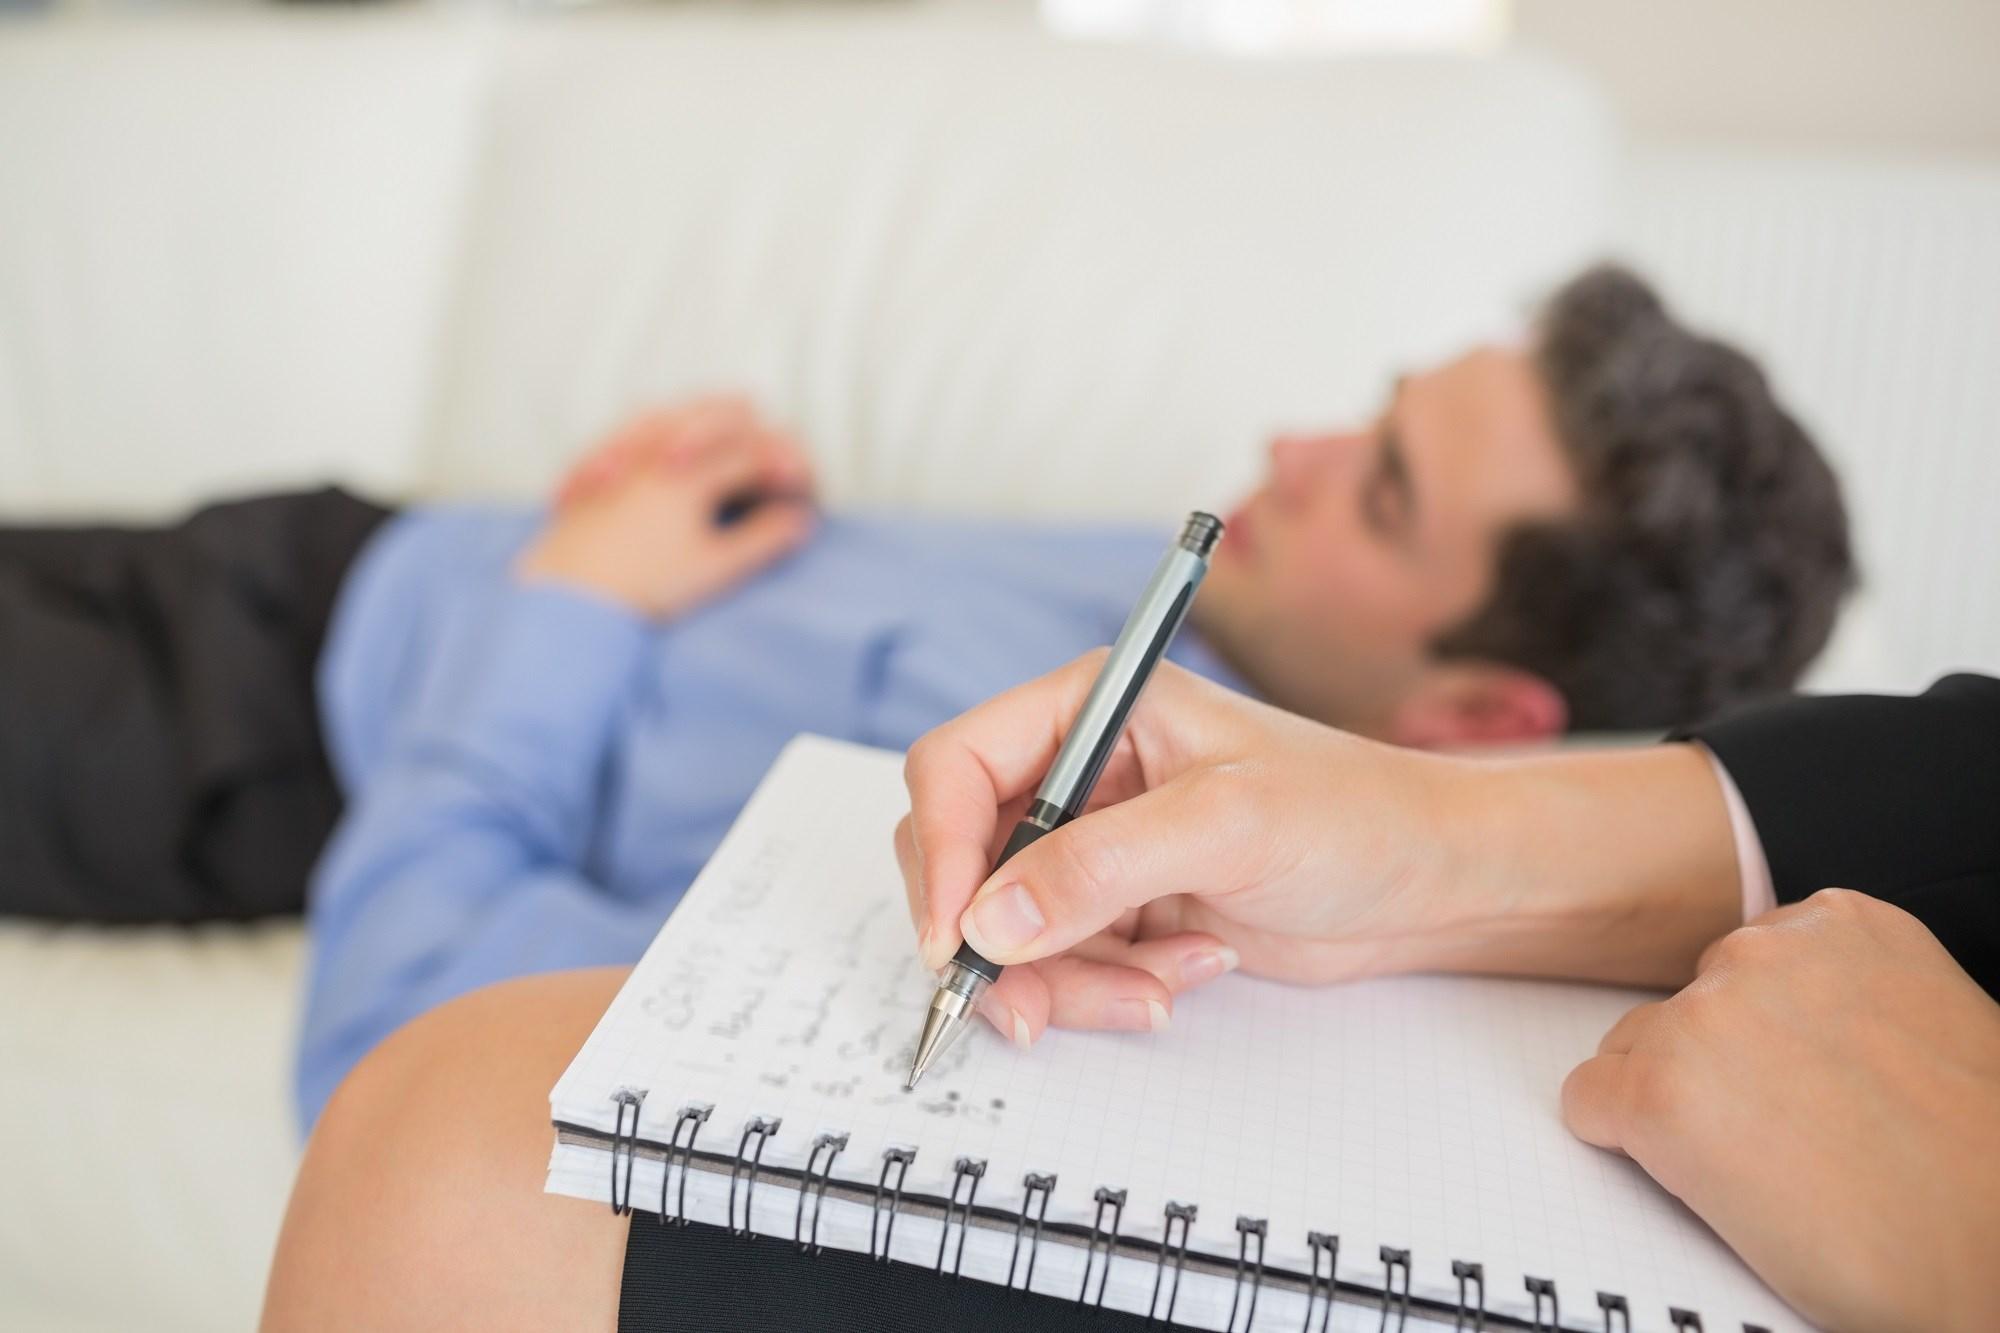 Brief Impression Questionnaire Useful in Schizophrenia Diagnoses